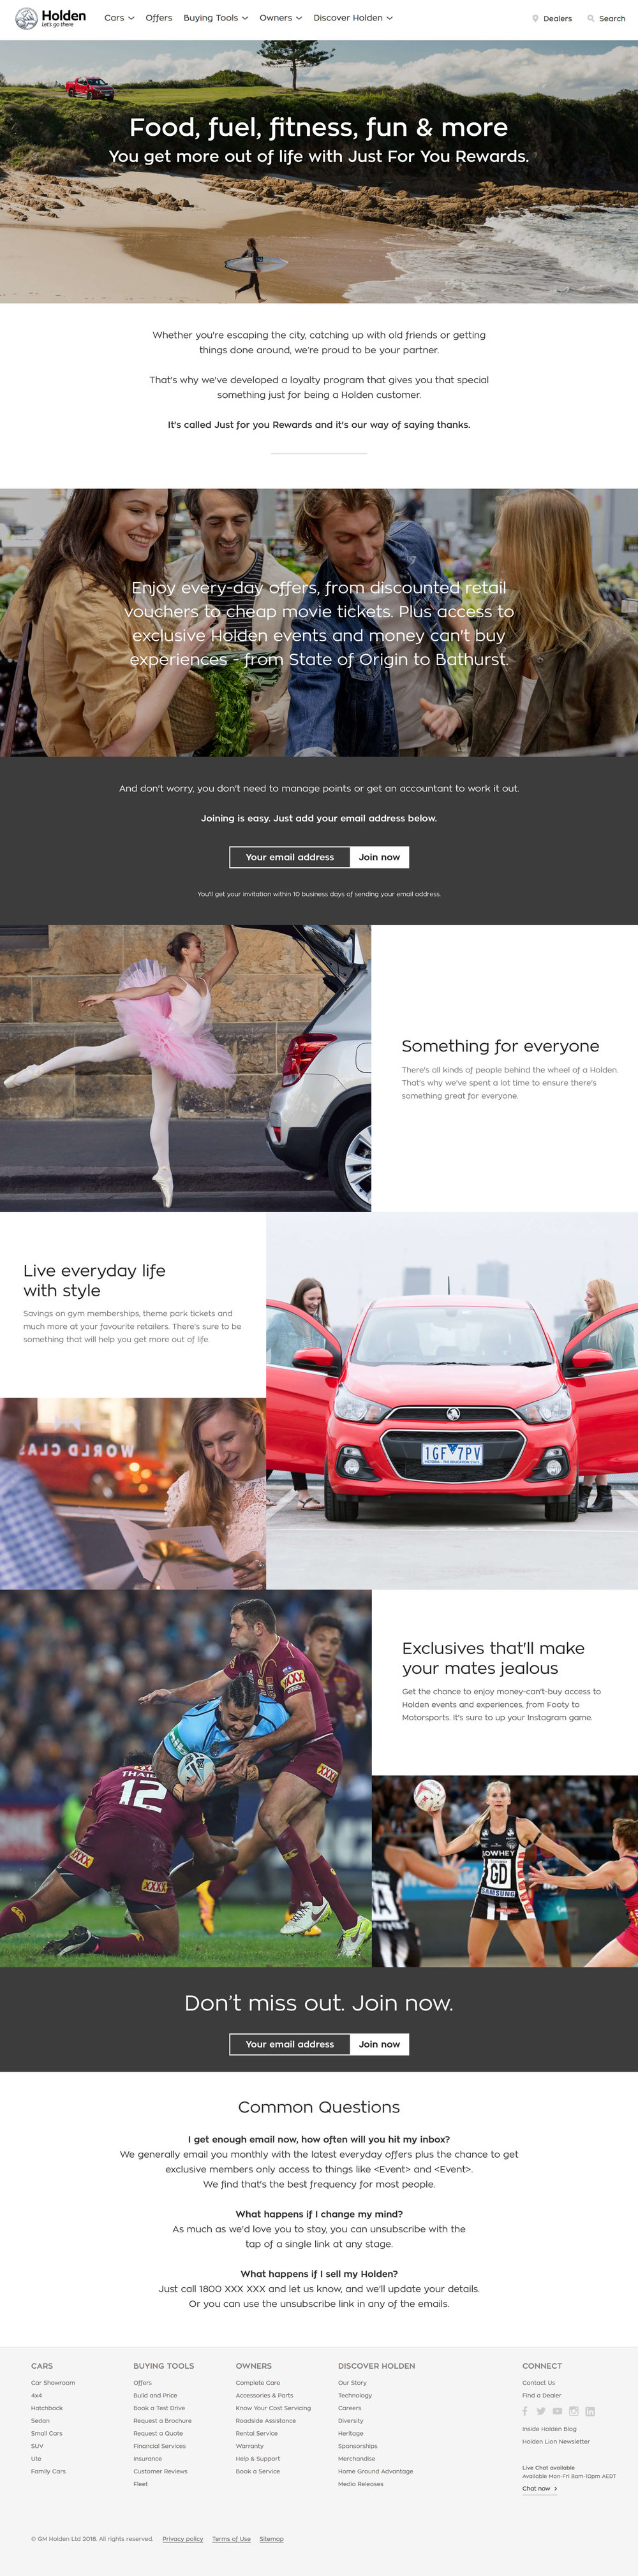 GM Holden: Just For You Rewards - Landing Page